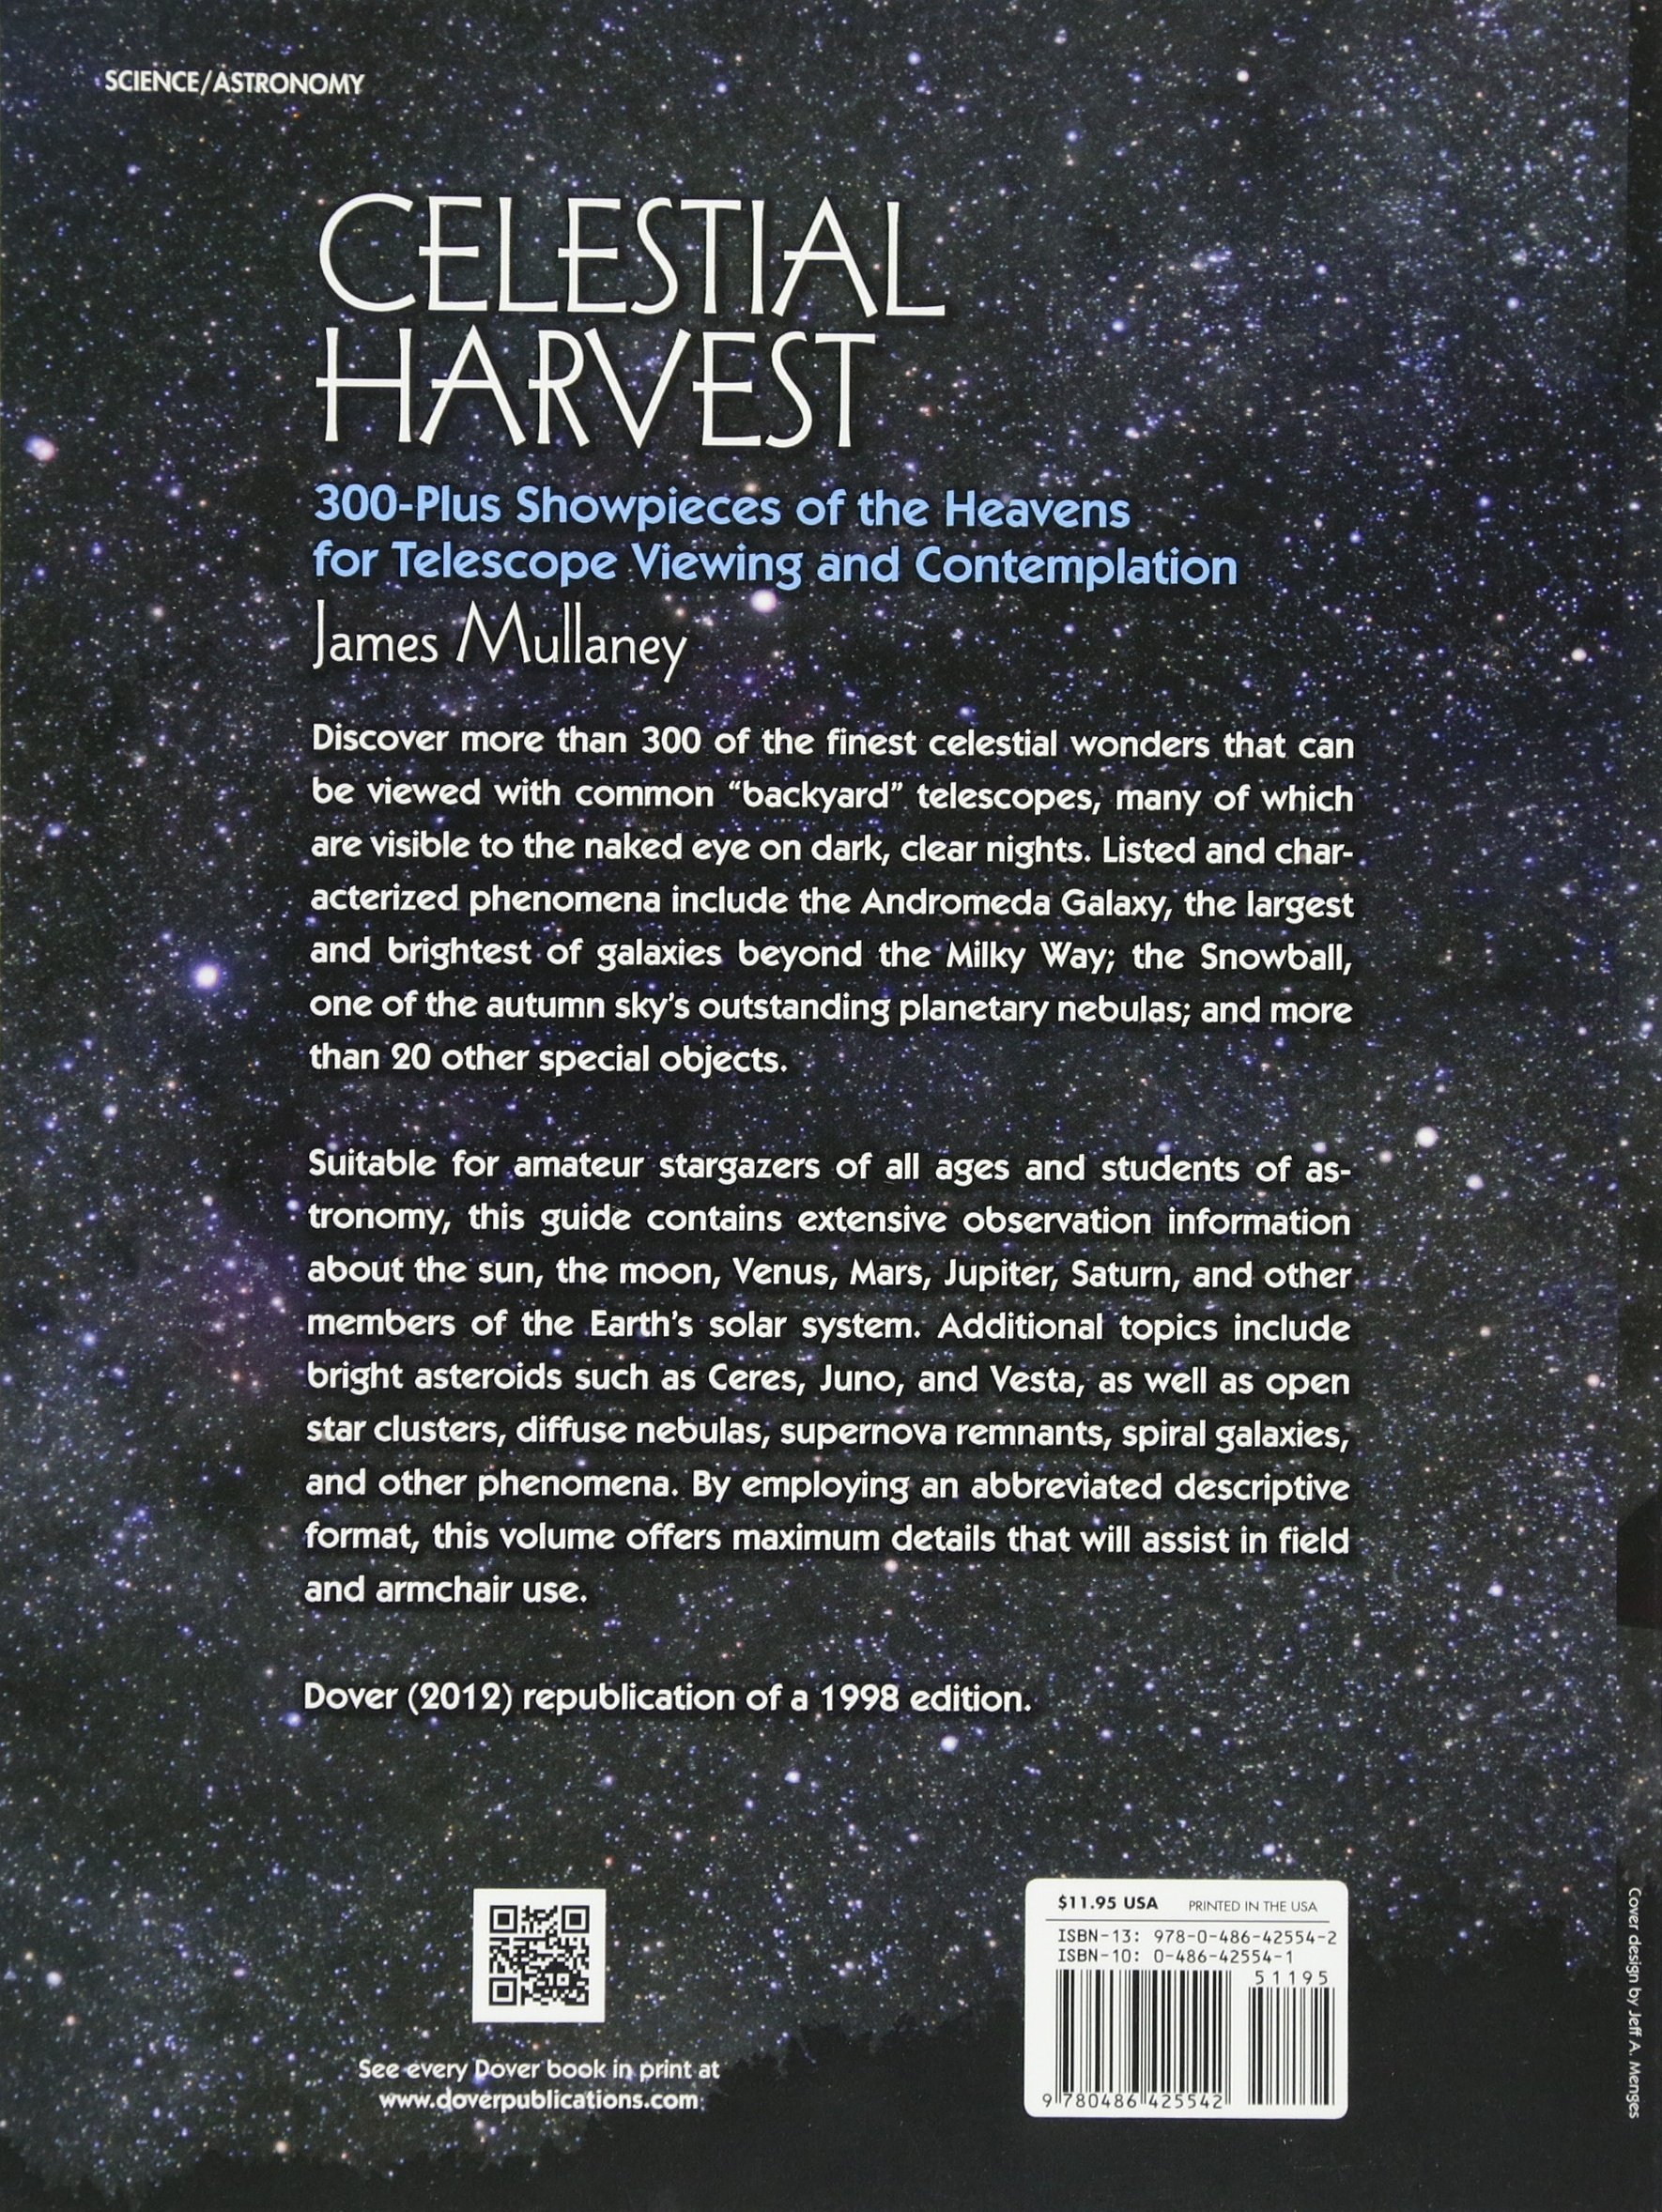 buy celestial harvest 300 plus showpieces of the heavens for